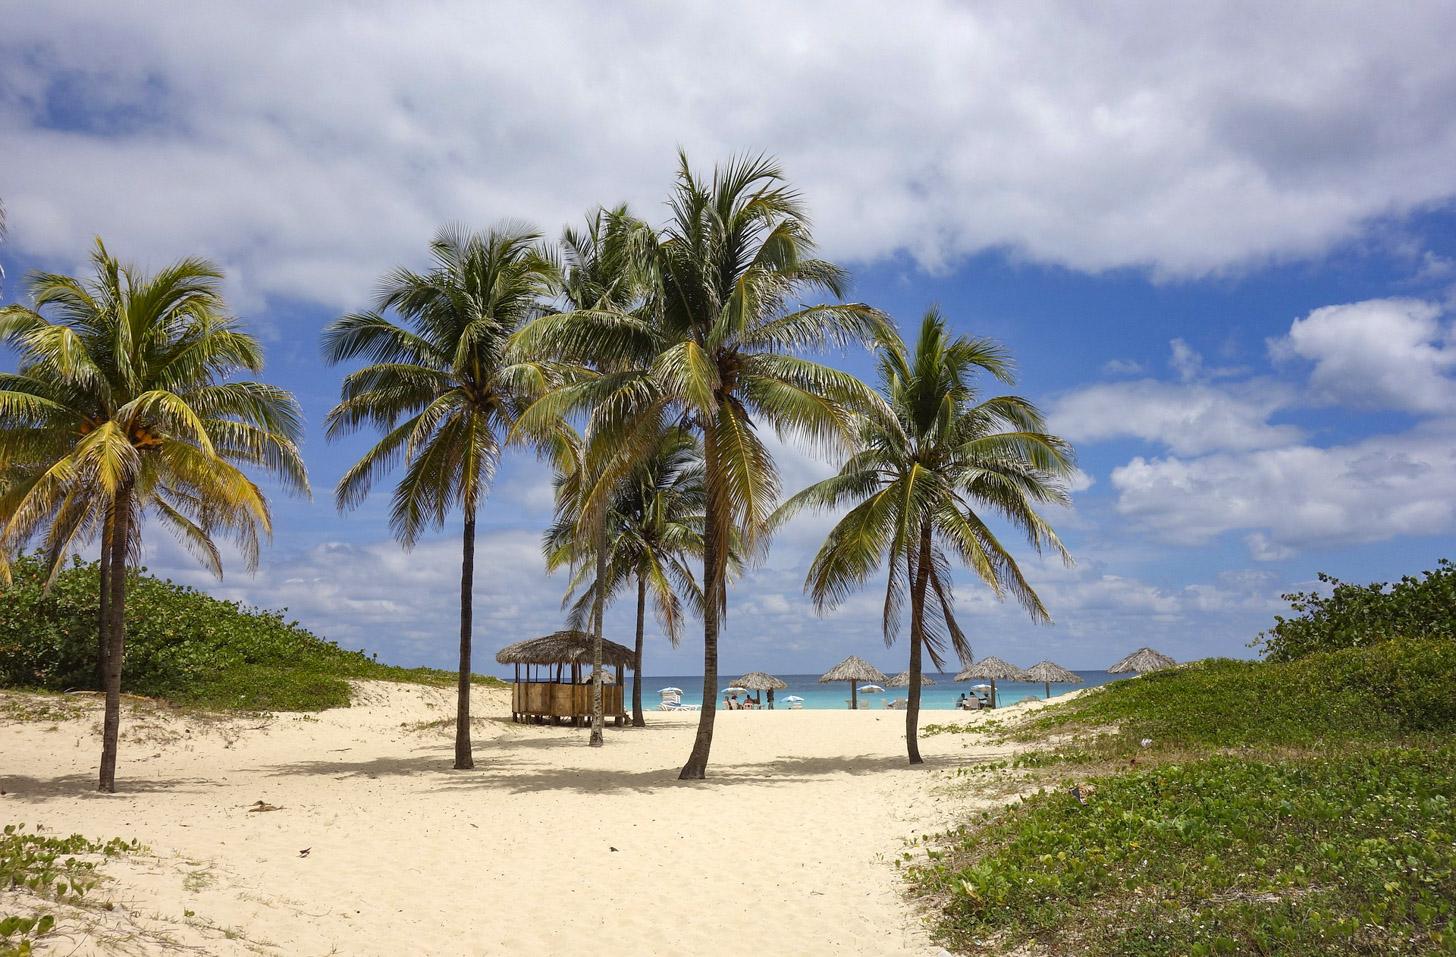 De stranden van Varadero